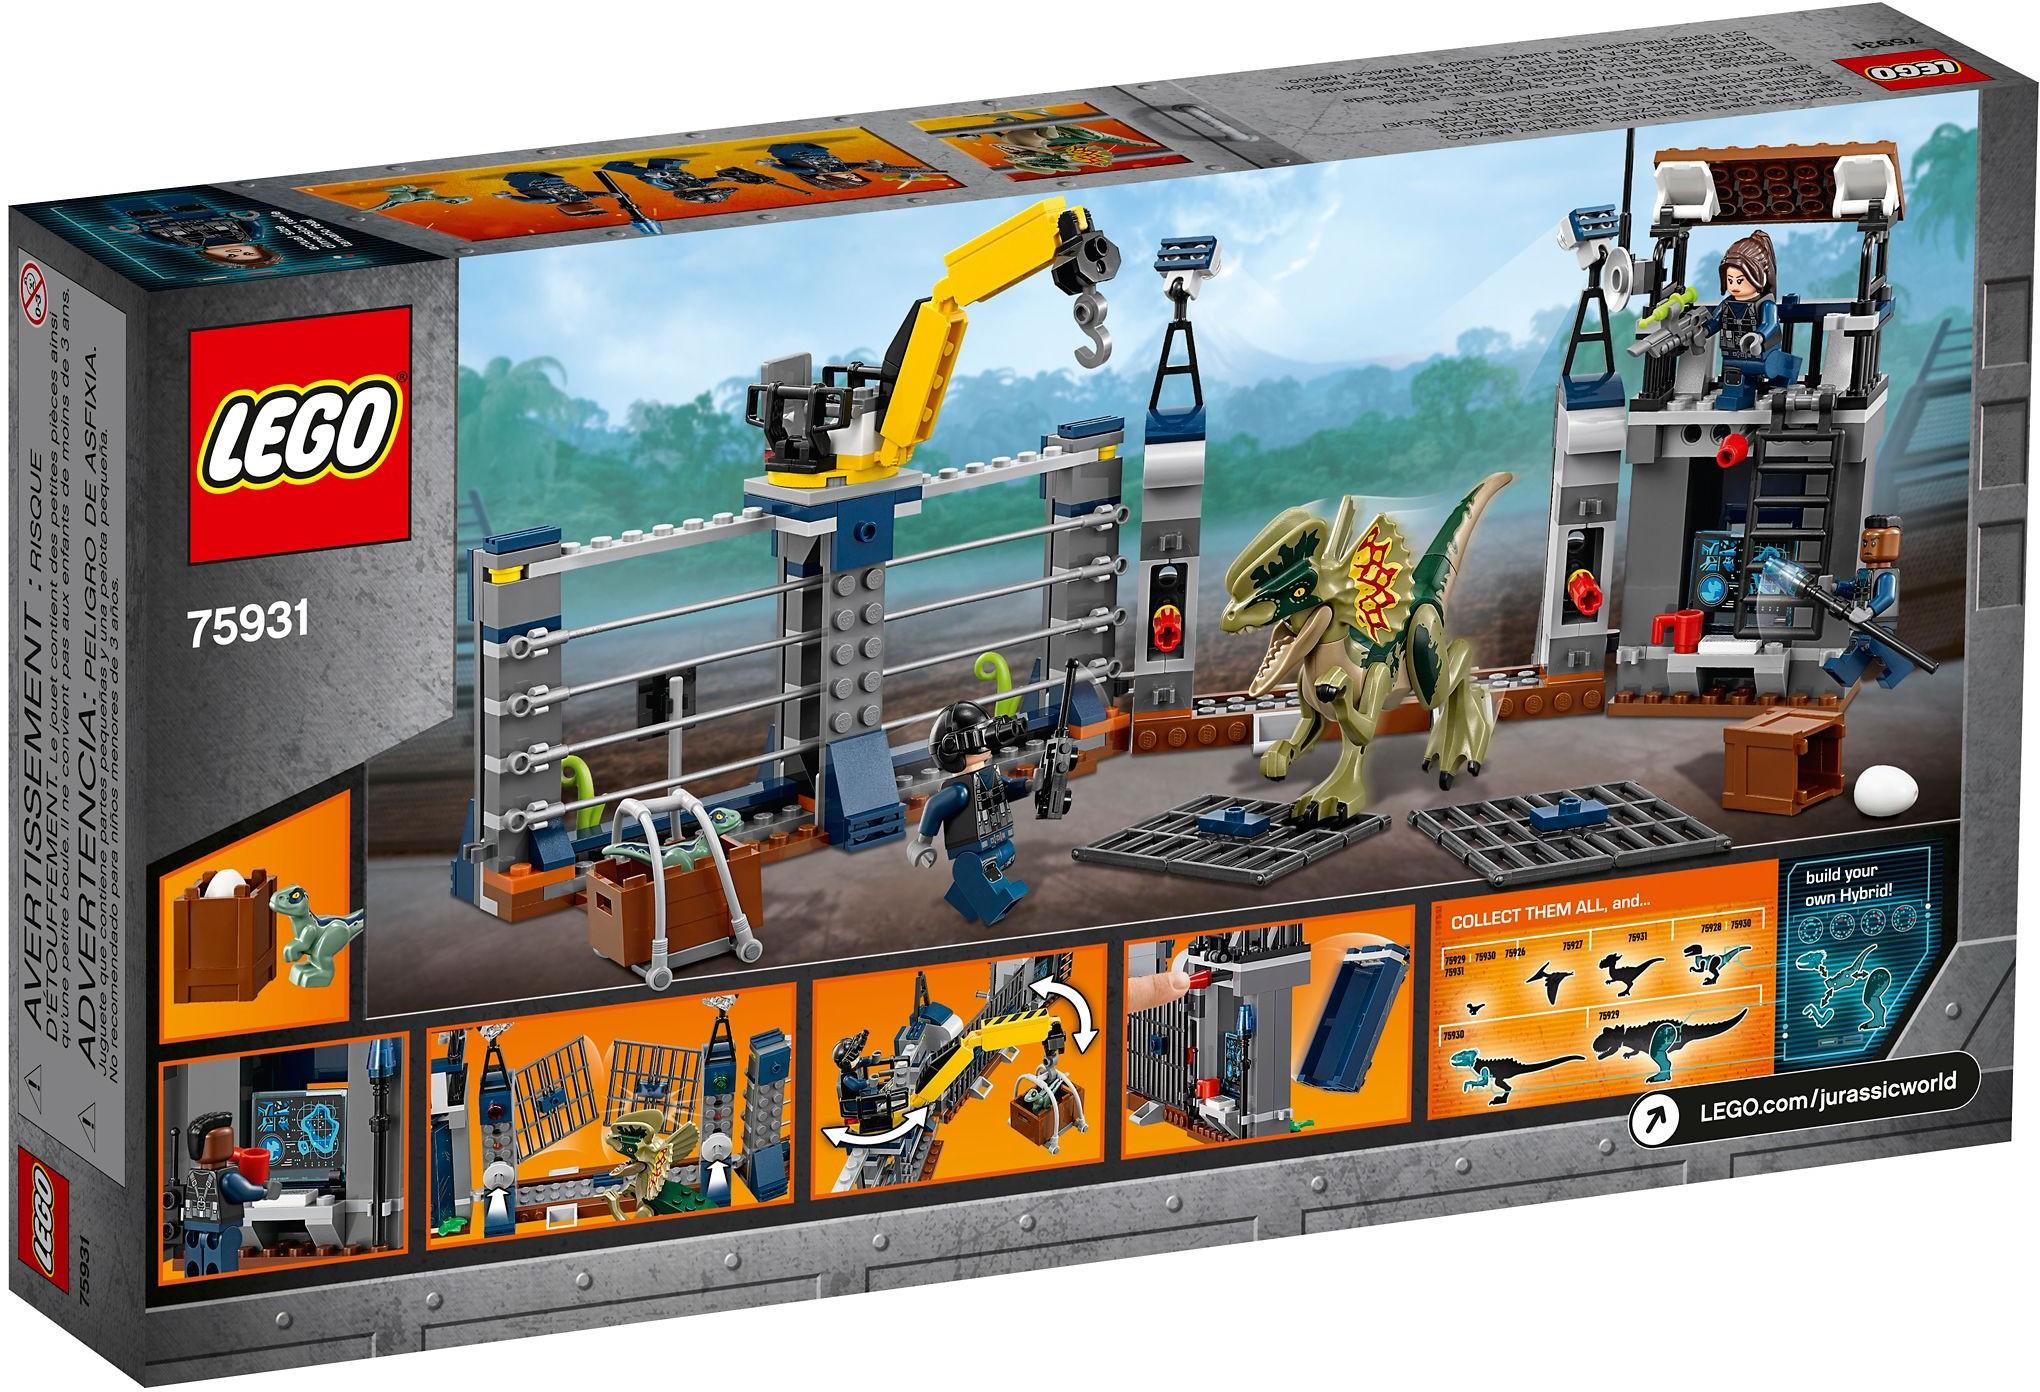 New Lego Jurassic World Minifigure TRACKER from set 75931